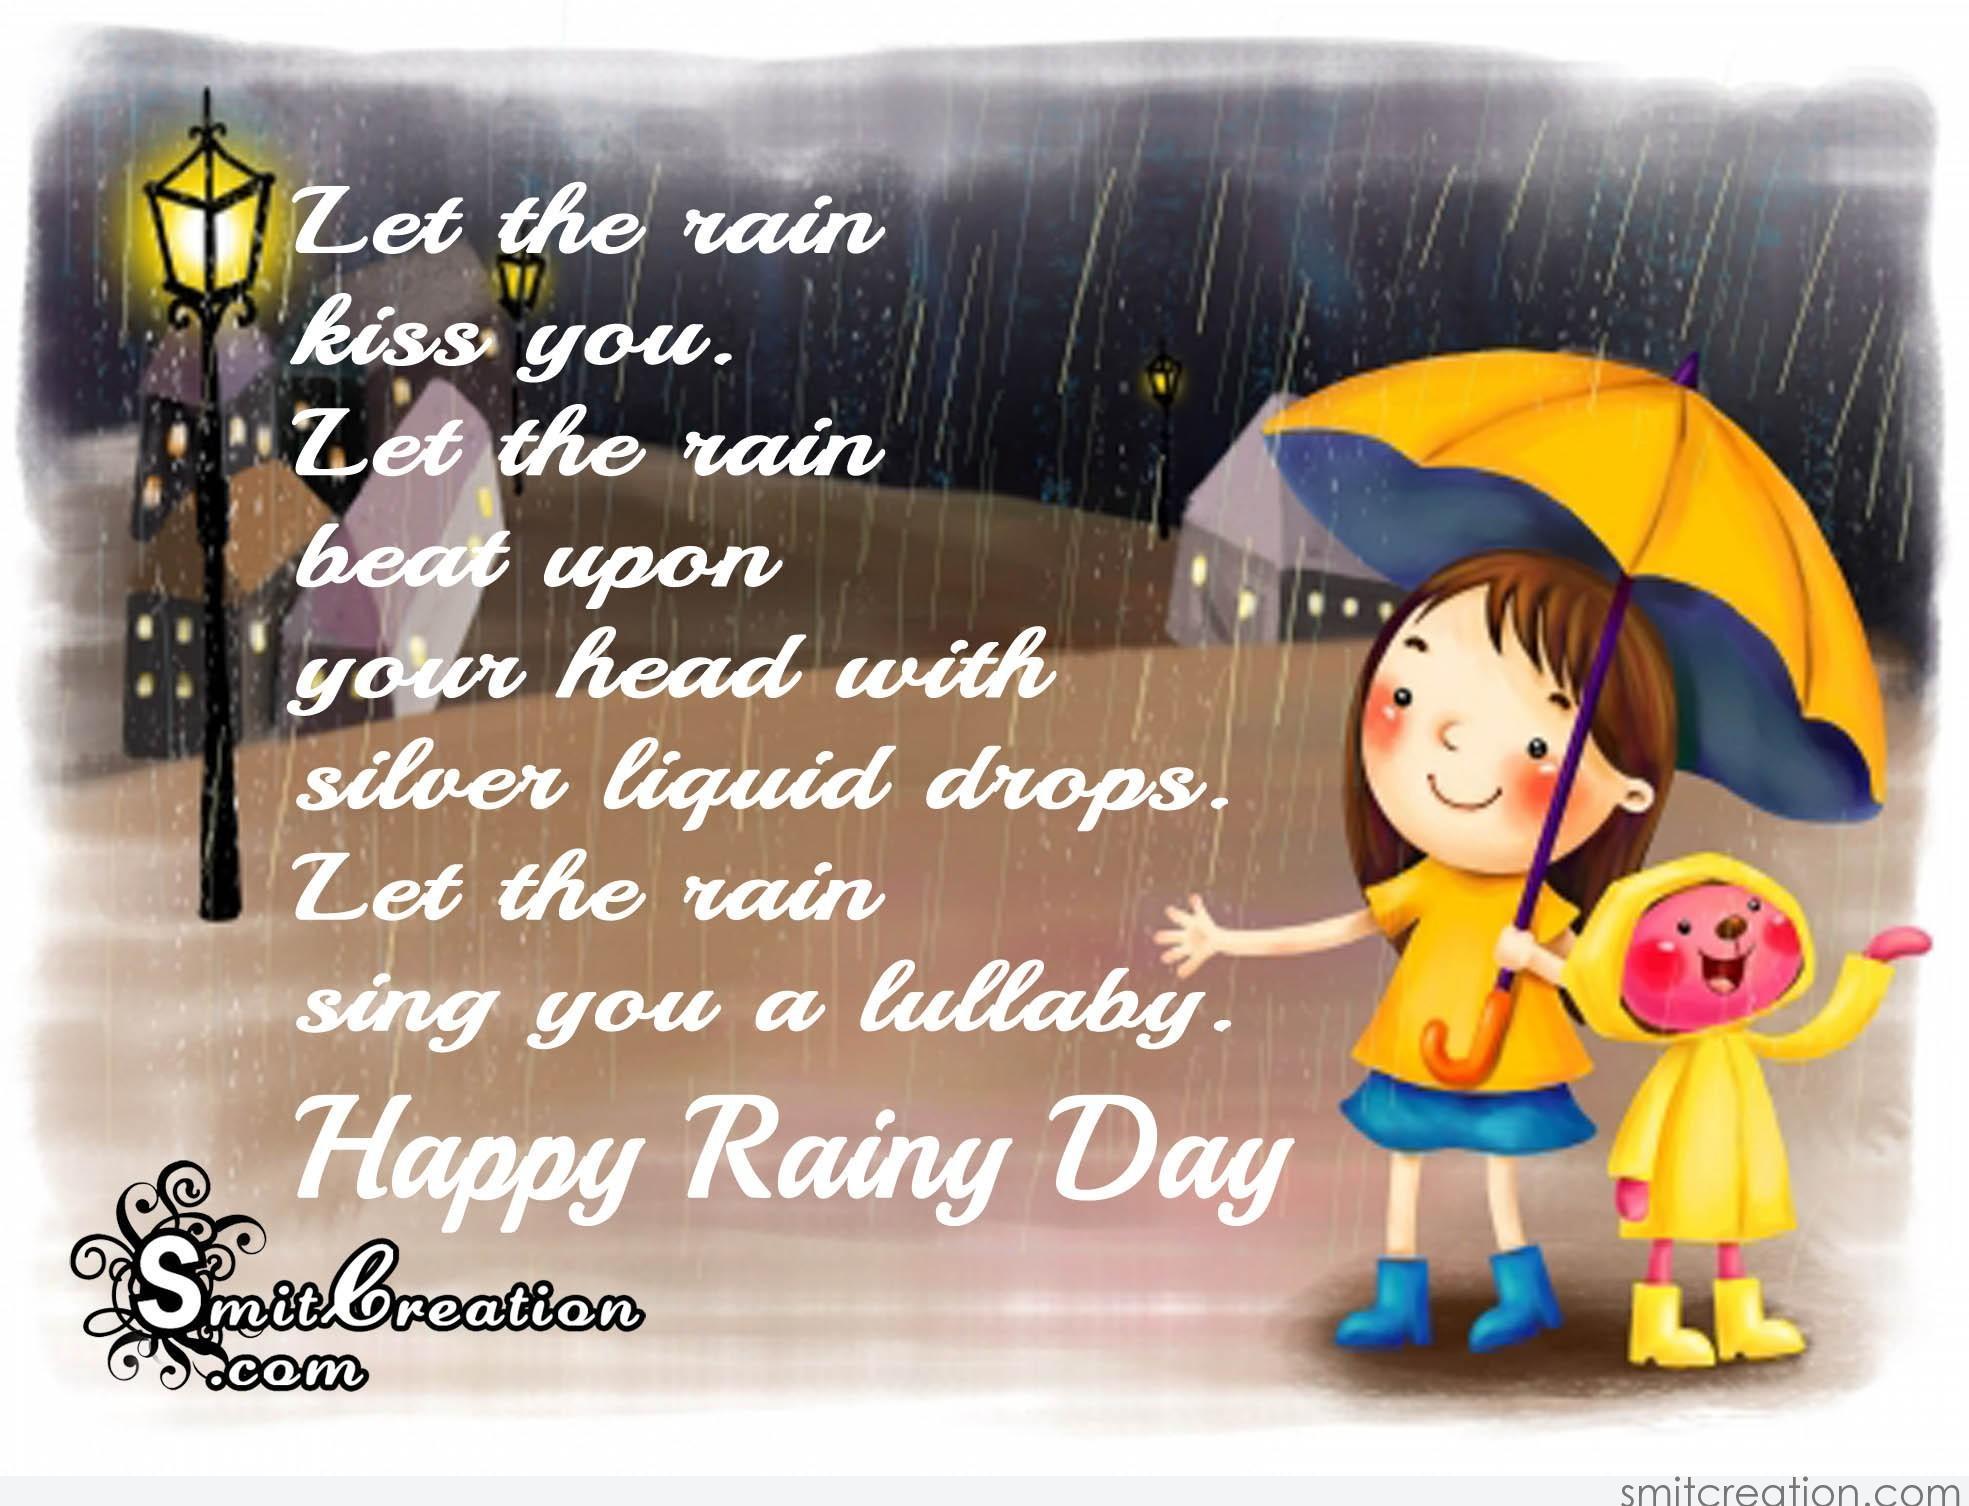 Good Morning Rainy Images: Good Morning Images For Rainy Day